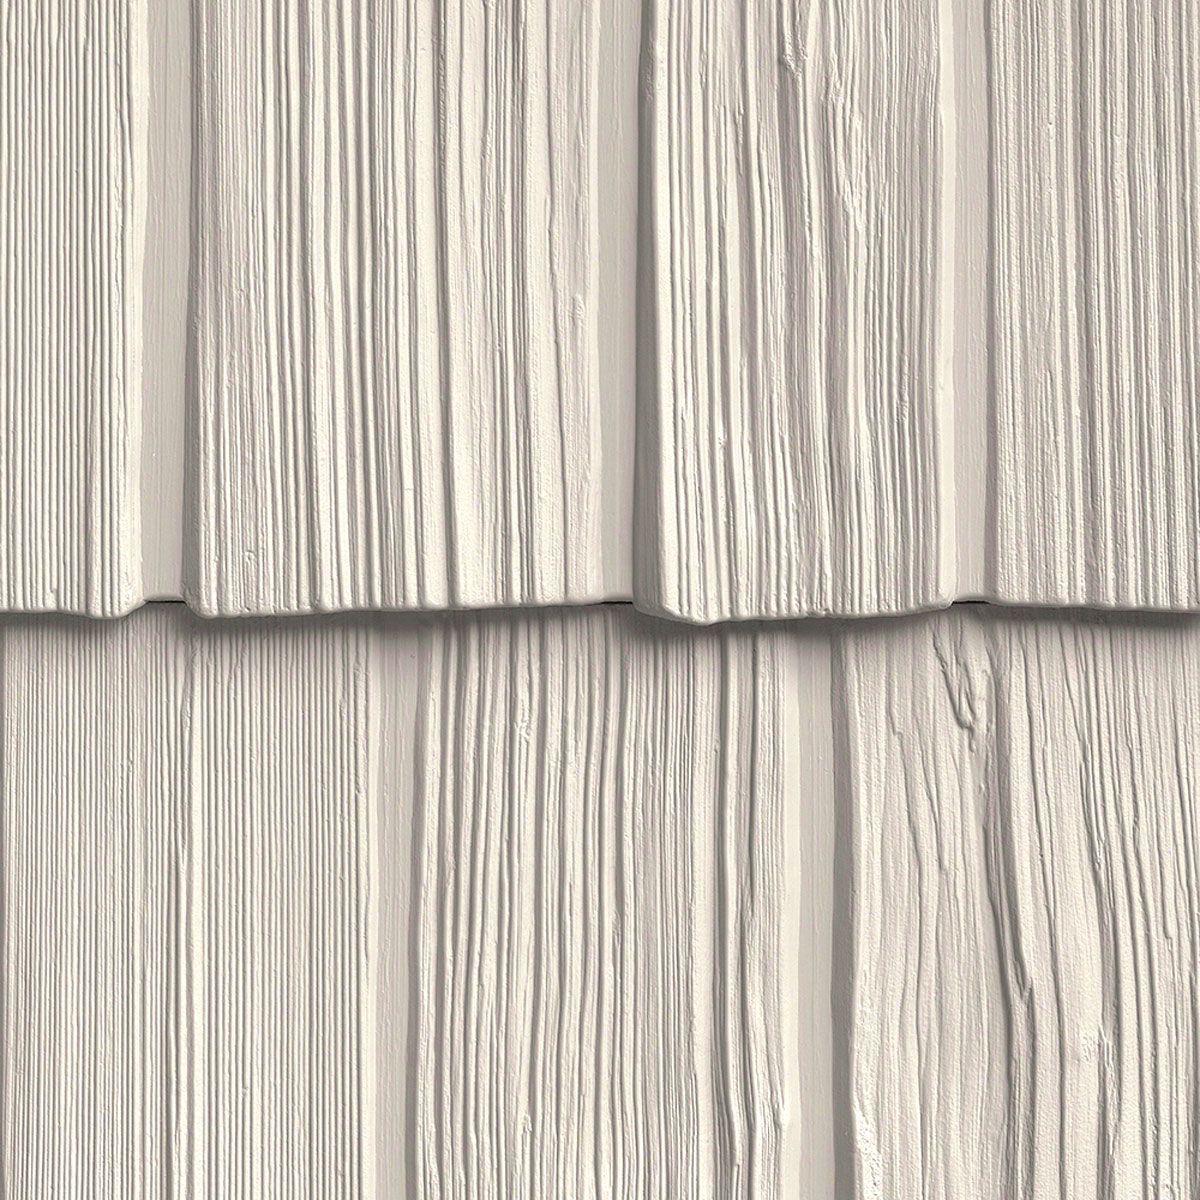 10 Inch W X 62 1 2 Inch L Exposure Vinyl Staggered Shakes 23 Panels Ctn 100 Sq Feet 116 Seashell Vinyl Cedar Shake Siding Vinyl Cedar Shake Siding